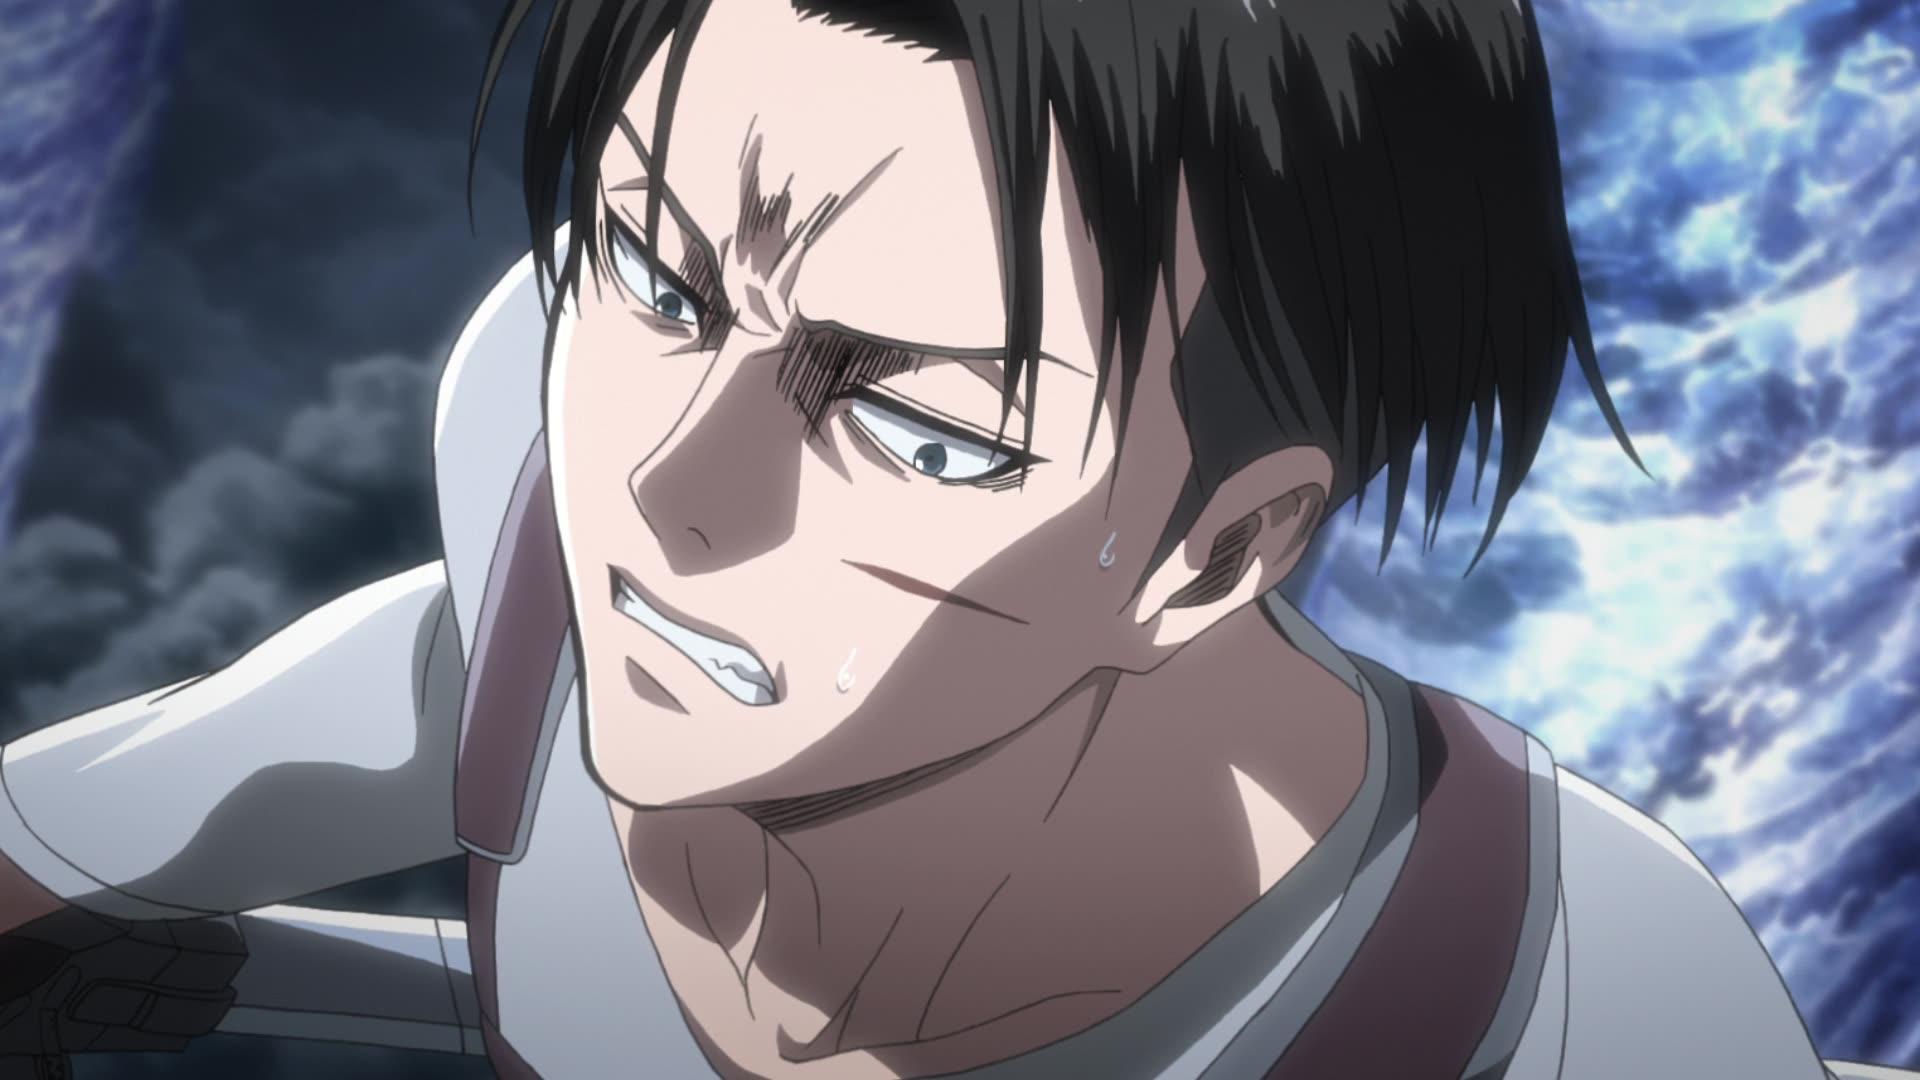 Attack on Titan Season 3 Episode 44, Wish, - Watch on Crunchyroll